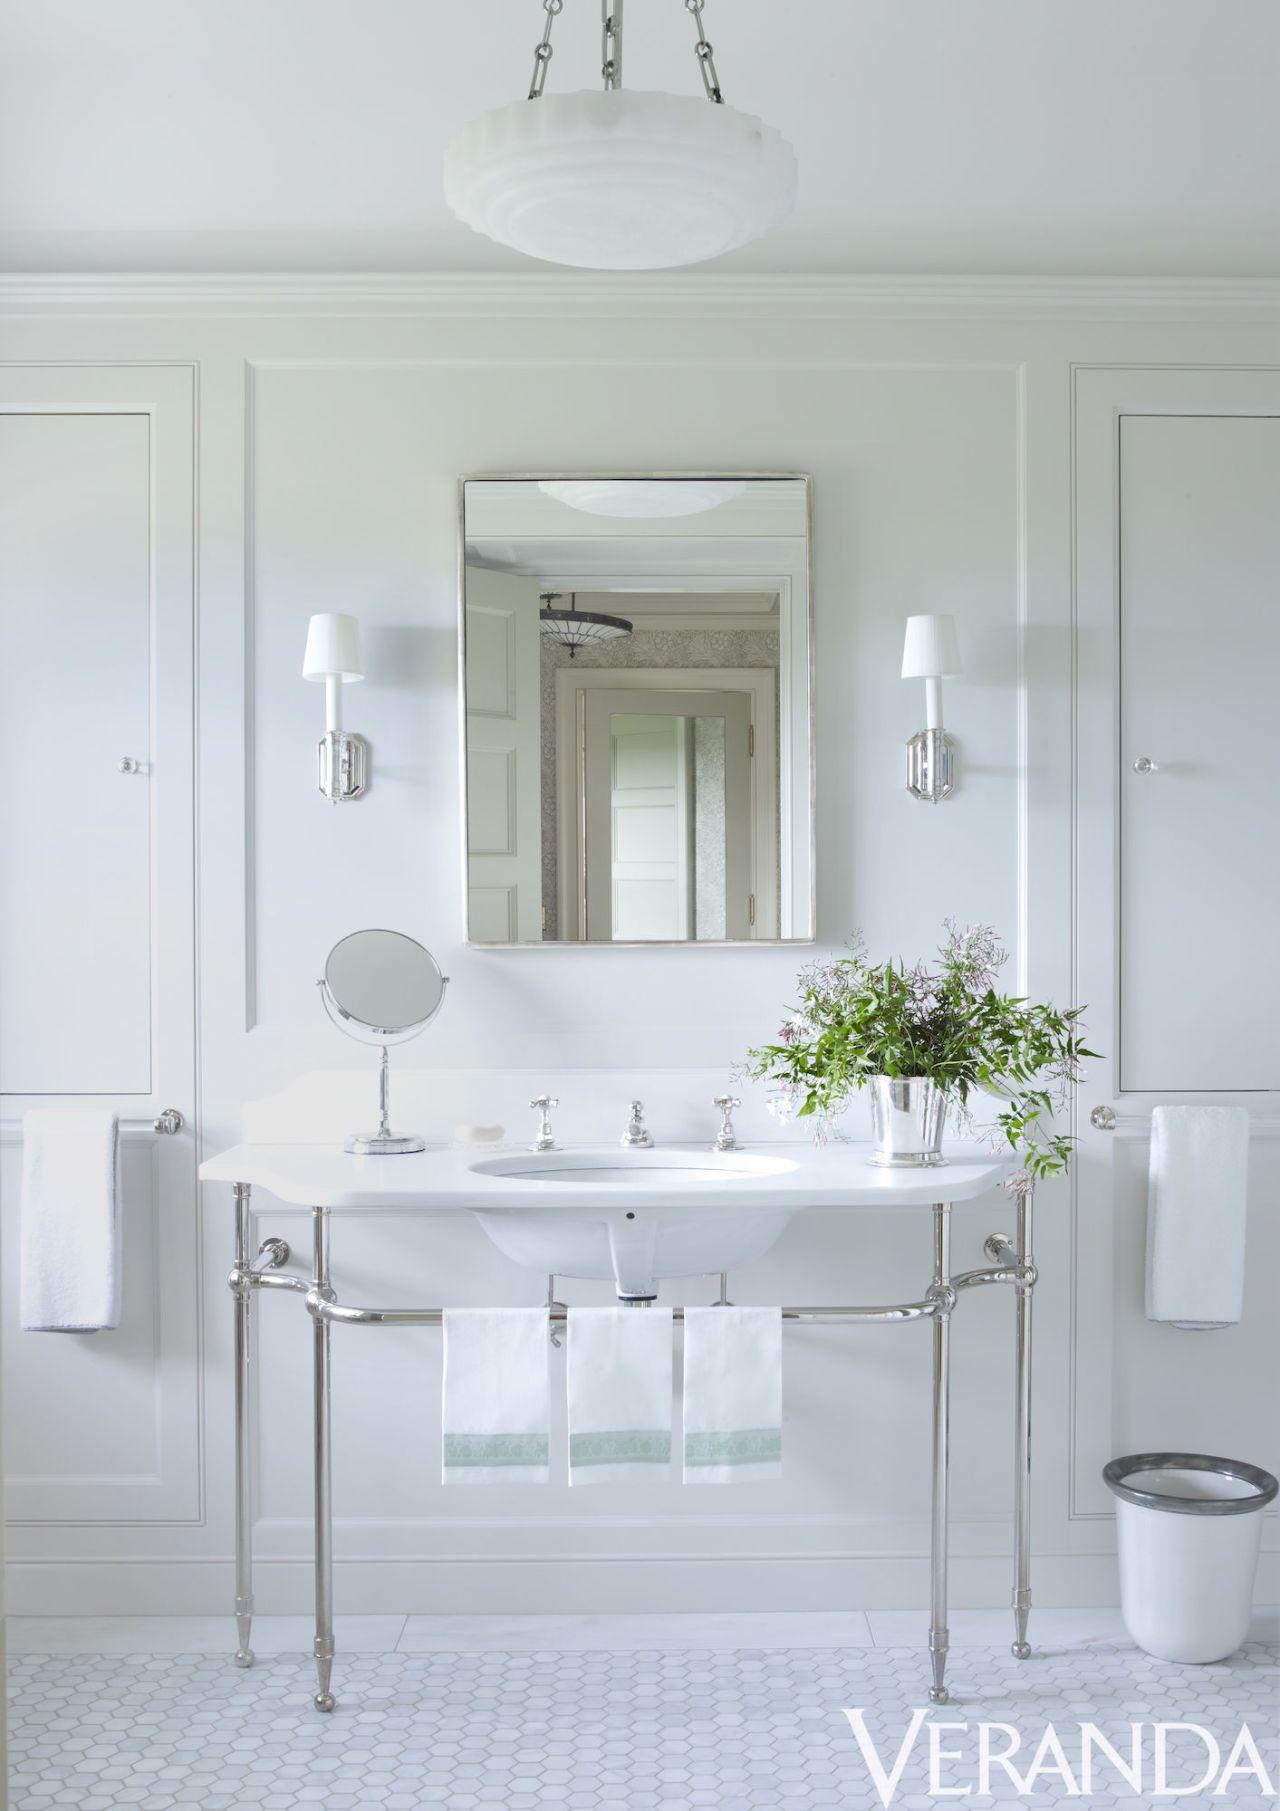 35+ Beautiful Bathroom Decorating Ideas | Verandas, Bath and Powder room